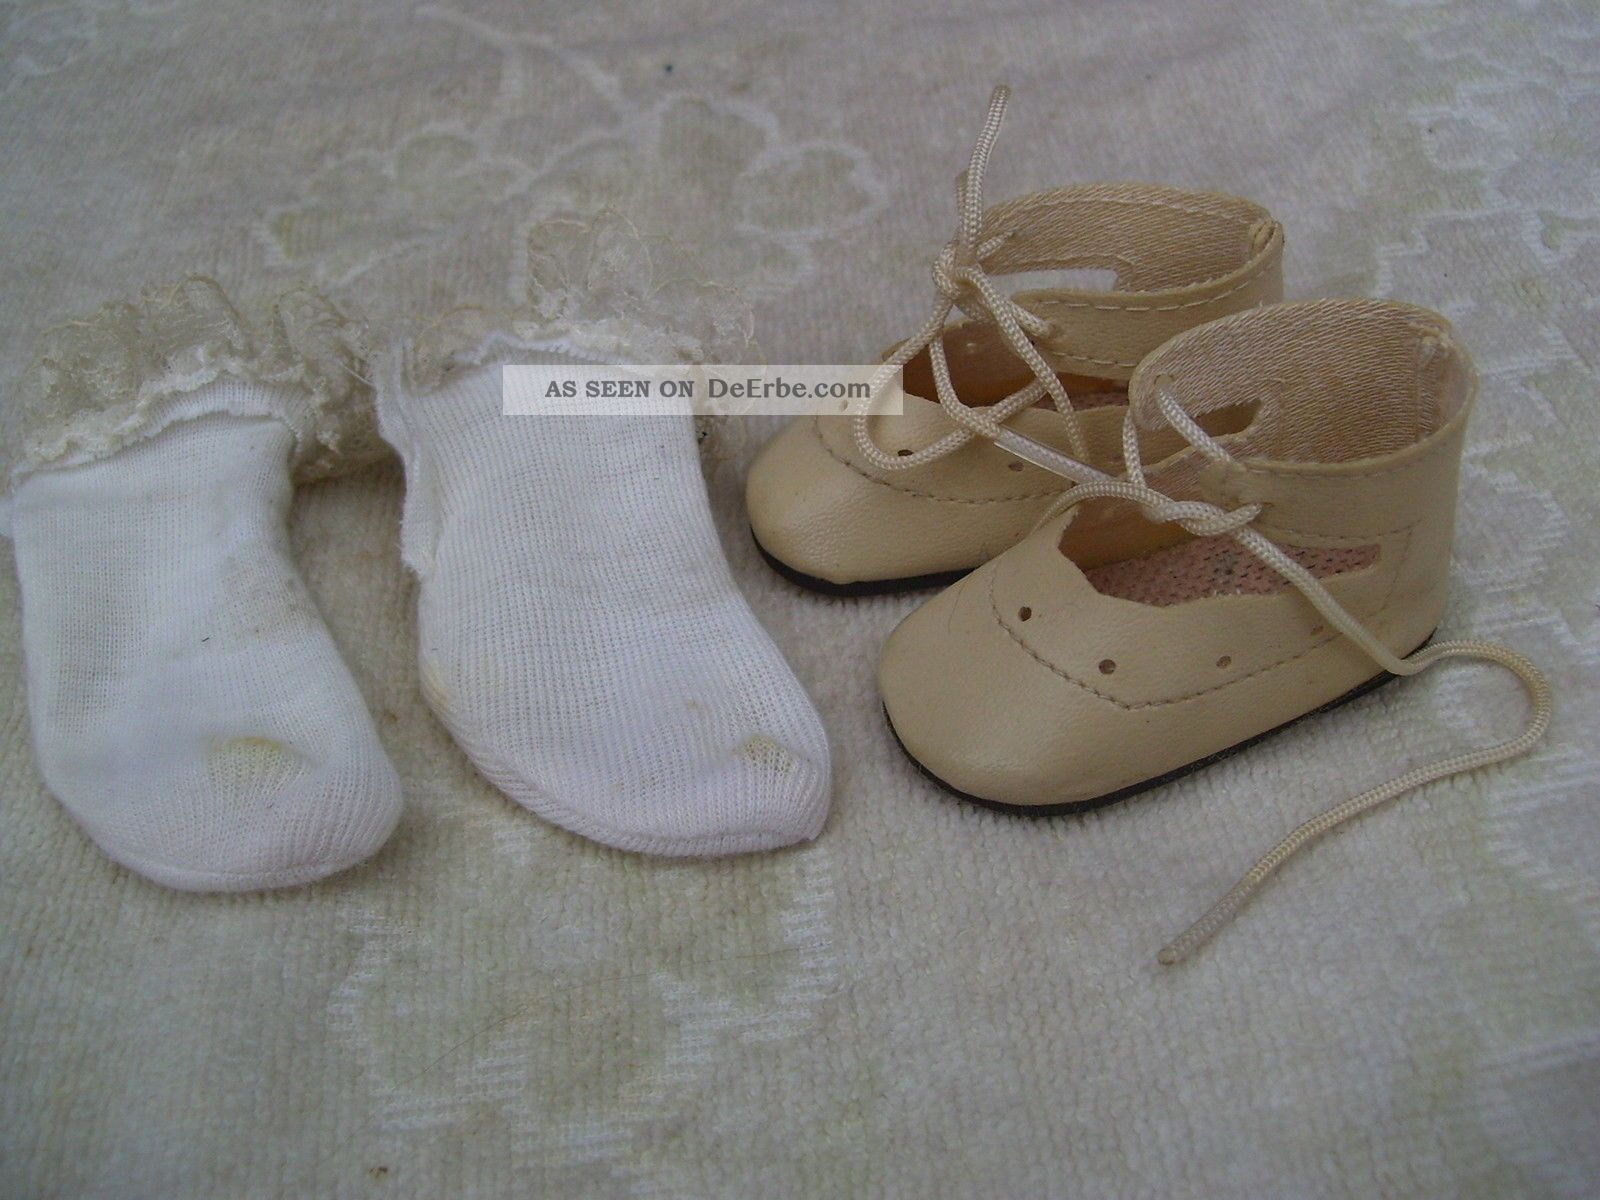 alte puppenkleidung schuhe vintage creme shoes lacy socks. Black Bedroom Furniture Sets. Home Design Ideas